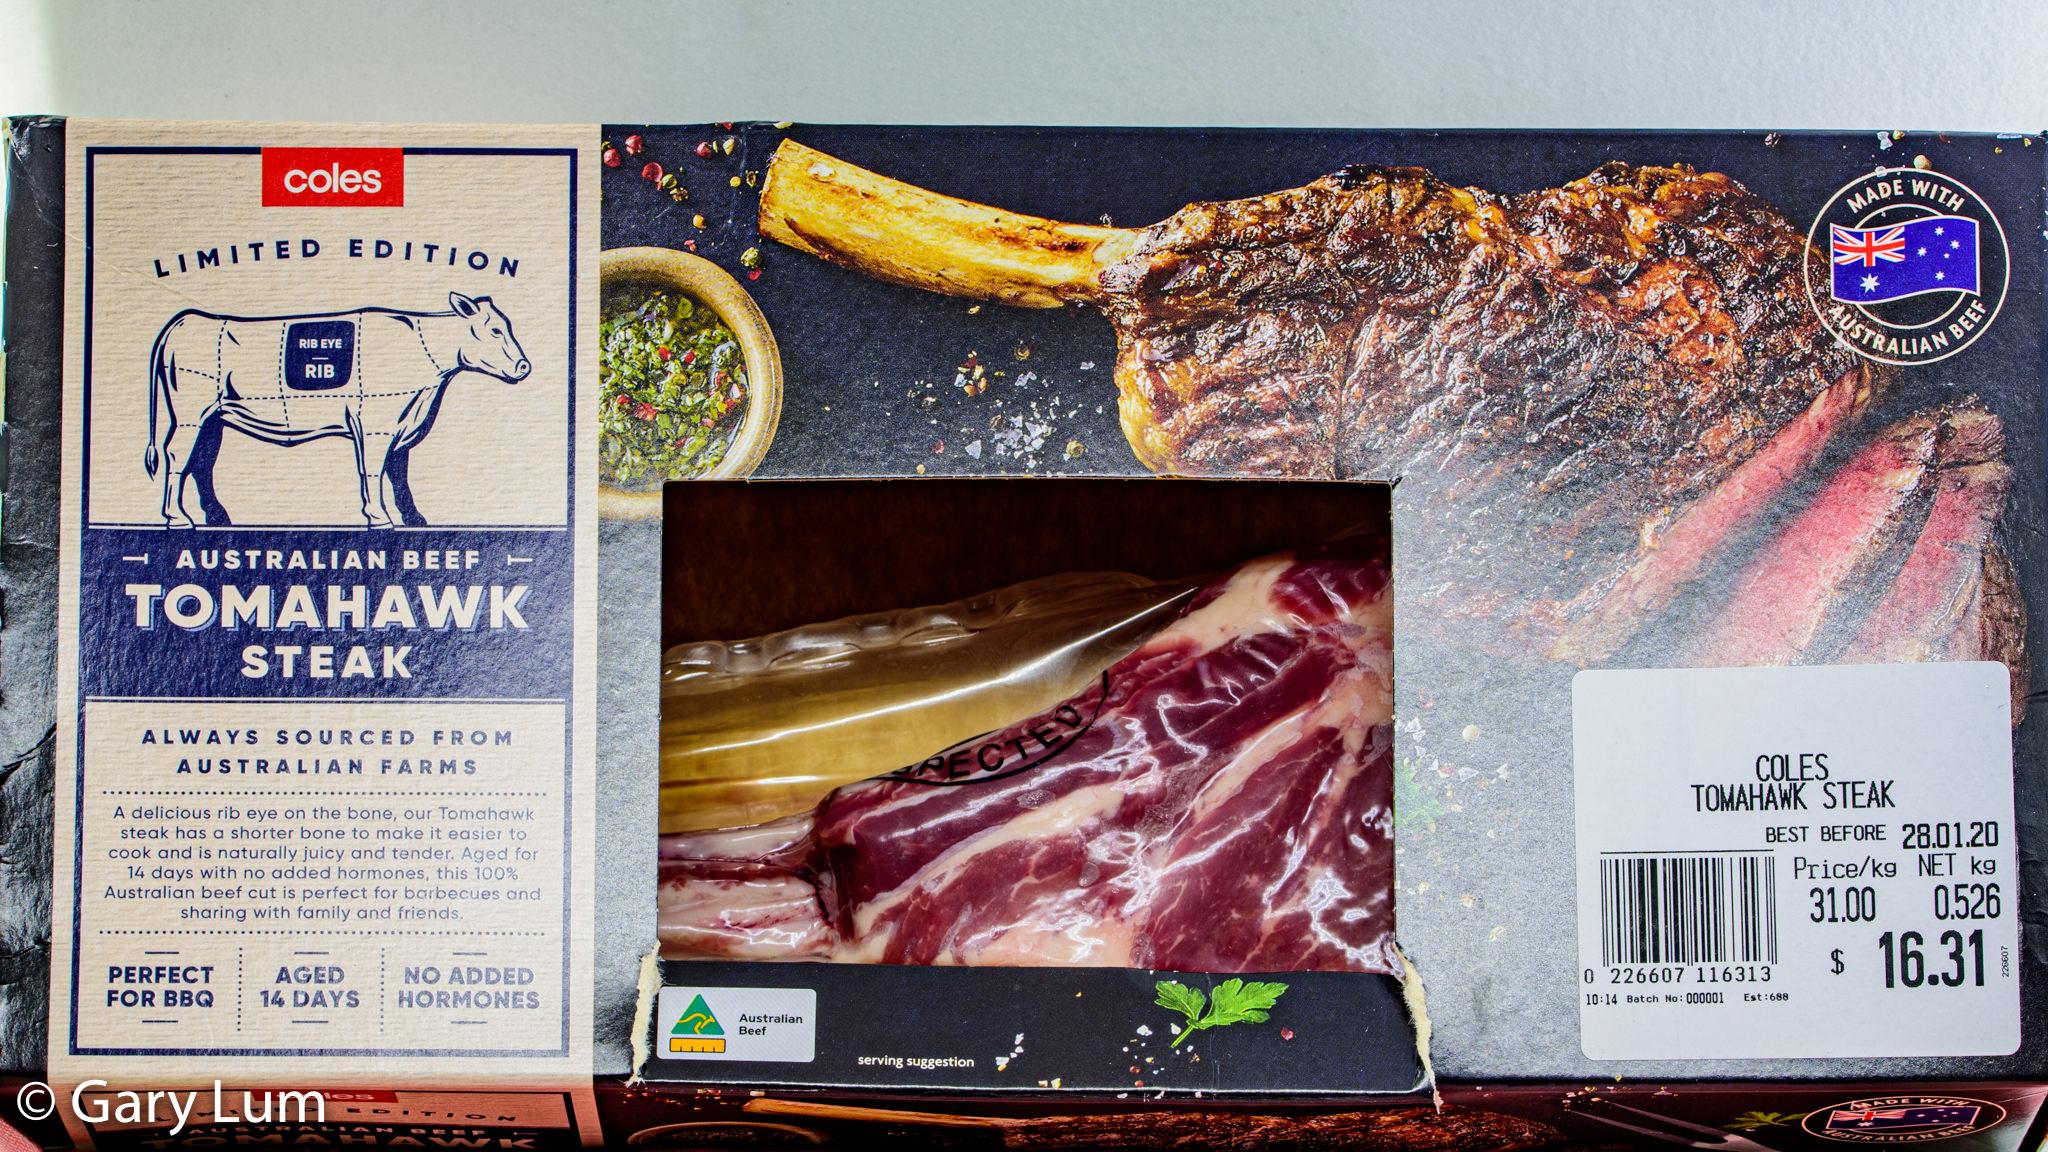 Coles Tomahawk Steak. Gary Lum.